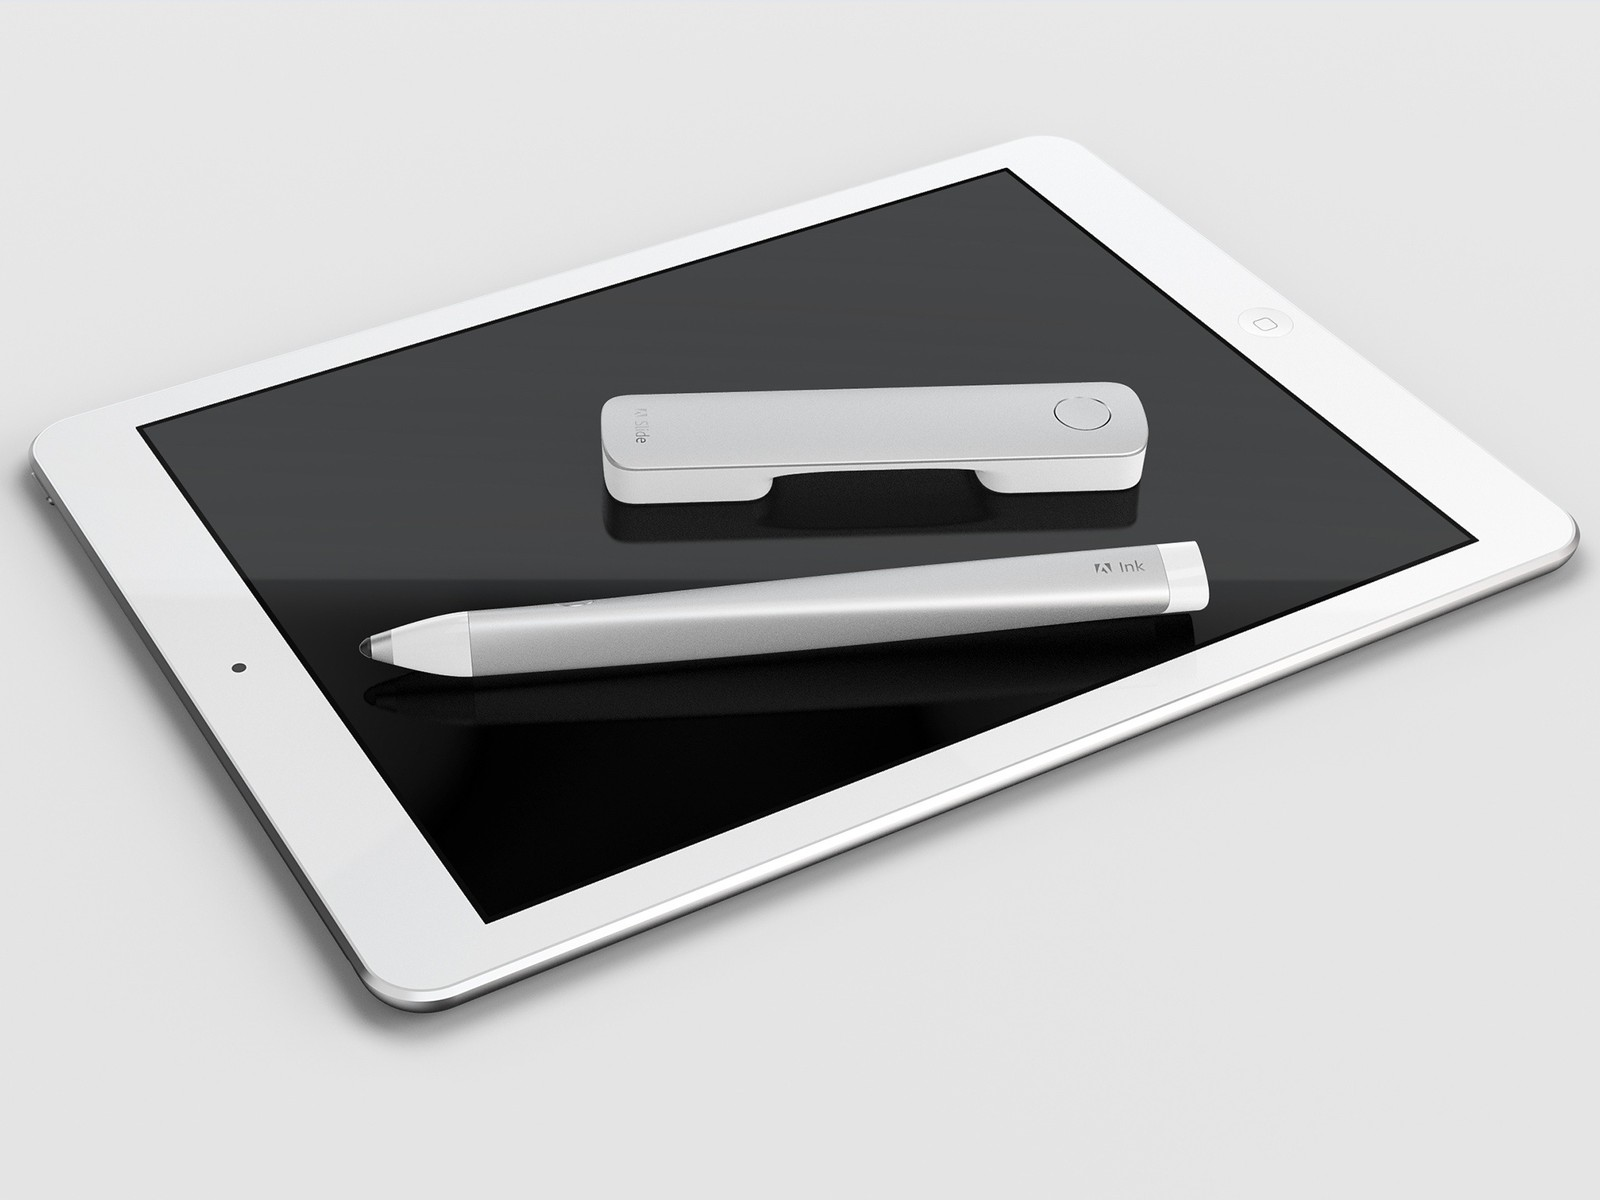 adobe ink and slide ipad